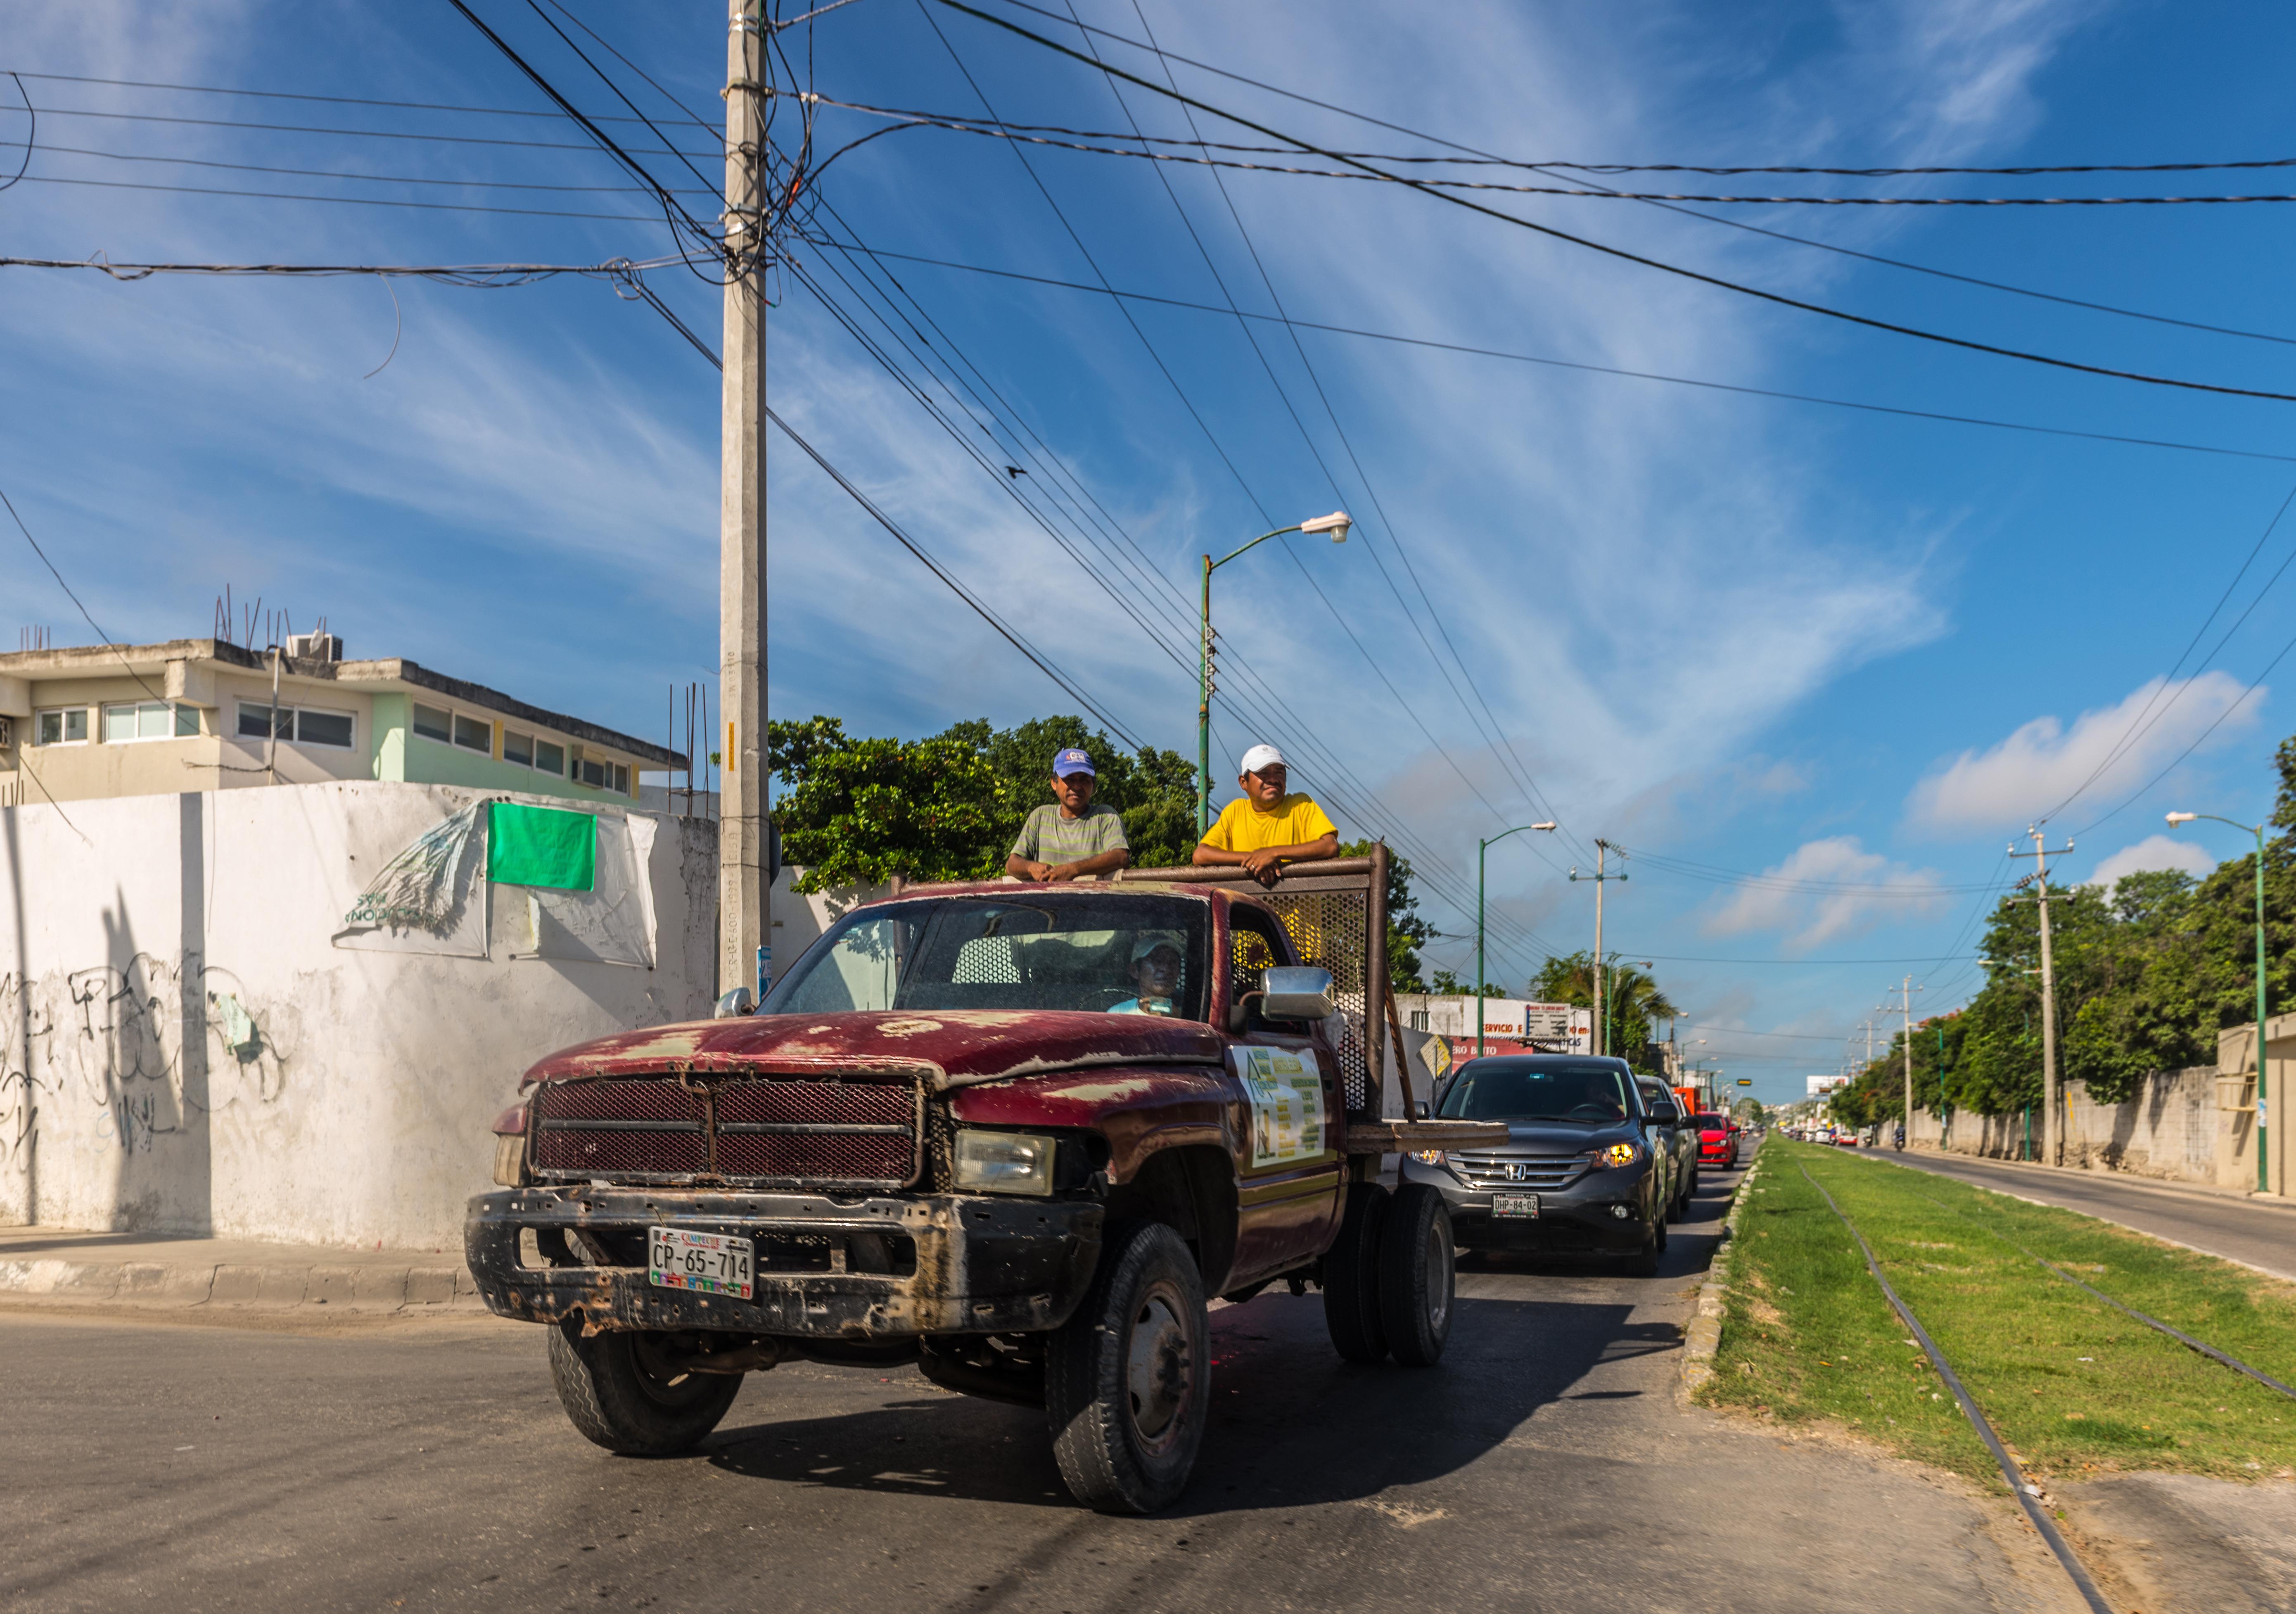 Datei:15-07-15-Campeche-Straßenszene-RalfR-WMA 0890.jpg – Wikipedia